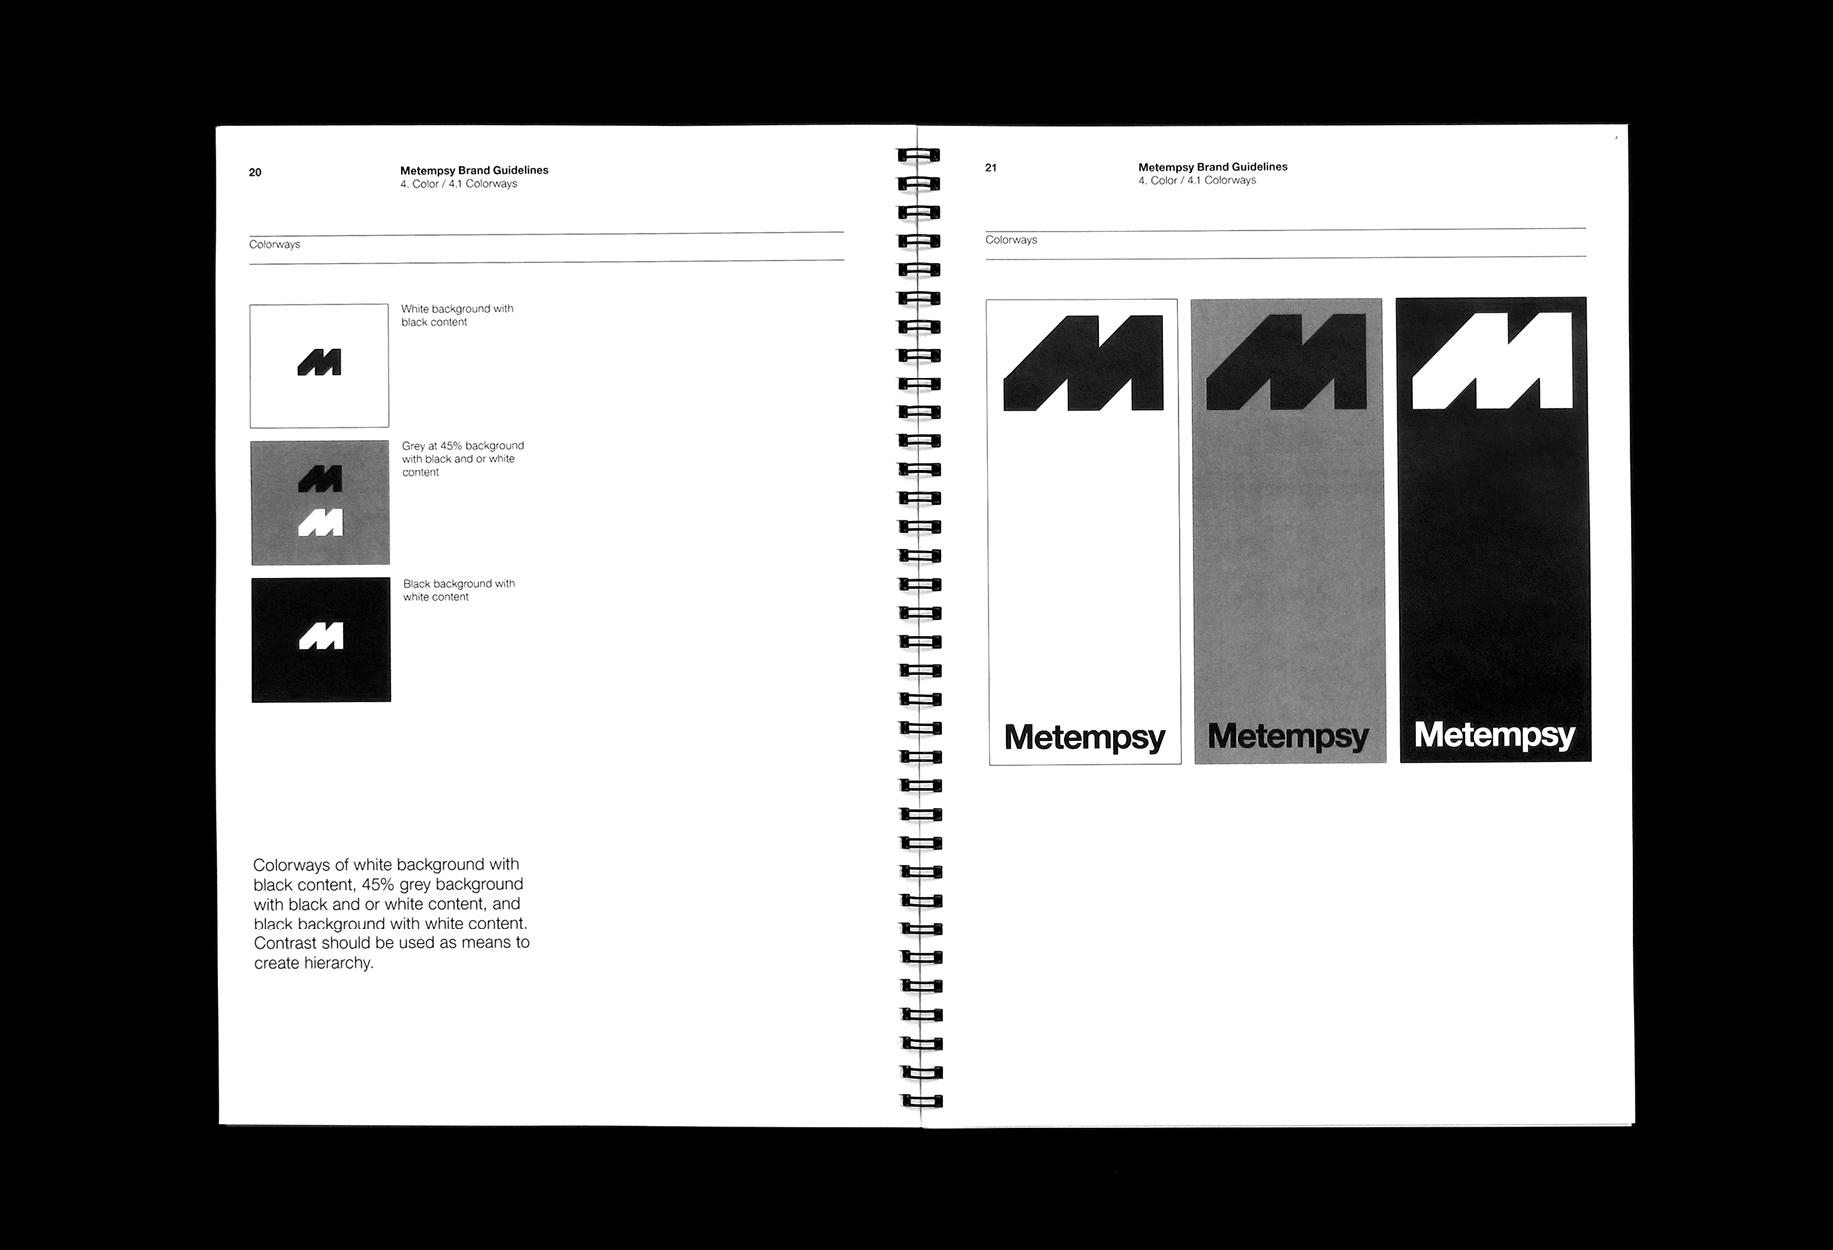 Metempsy-Graphic-Design-Standards-Manual-11.jpg